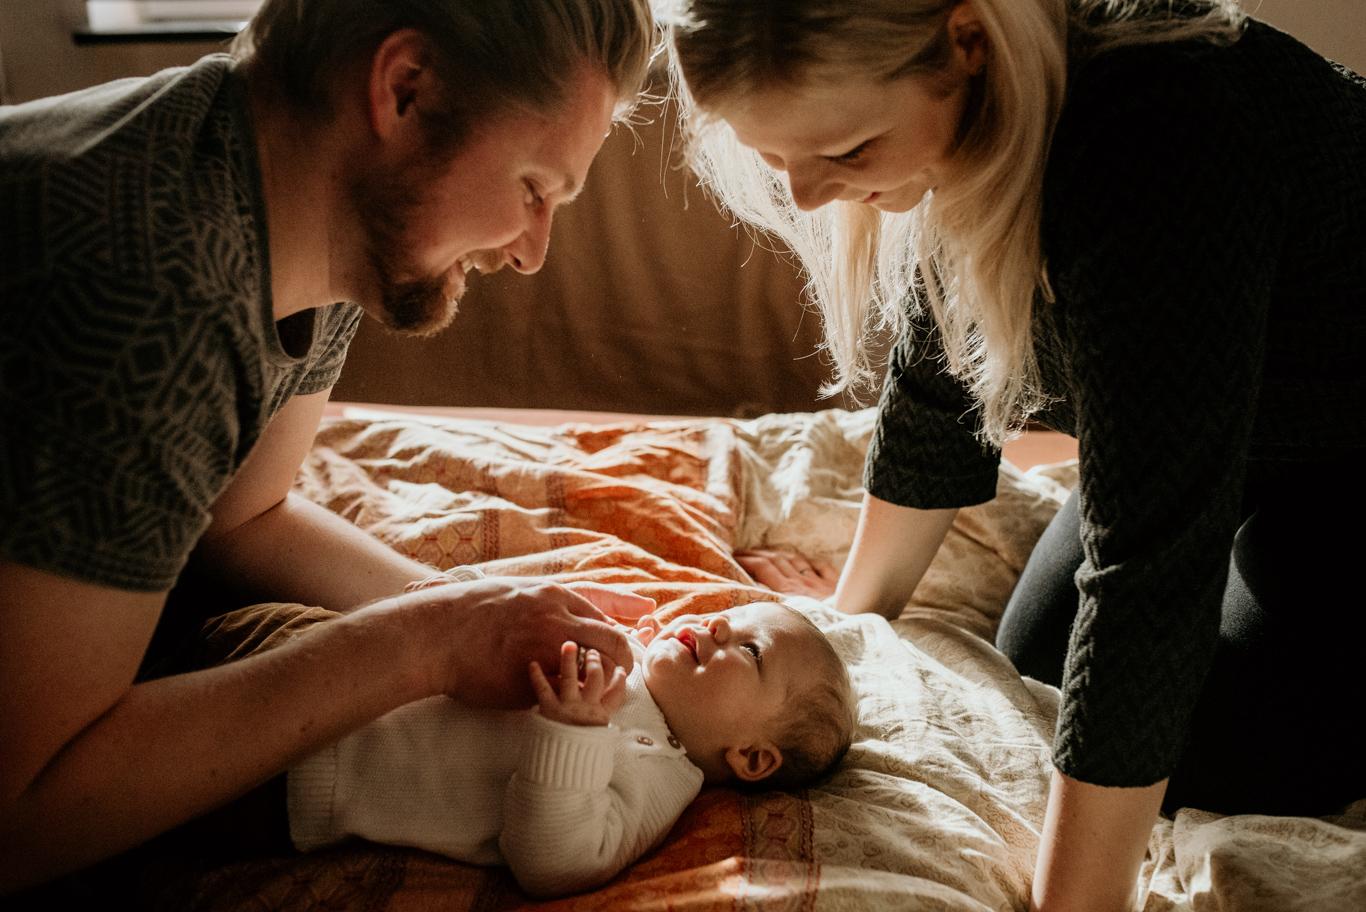 Babyfotograf Mannheim Babyfotografie Newborn Fotograf Familienfotograf Ludwigshafen